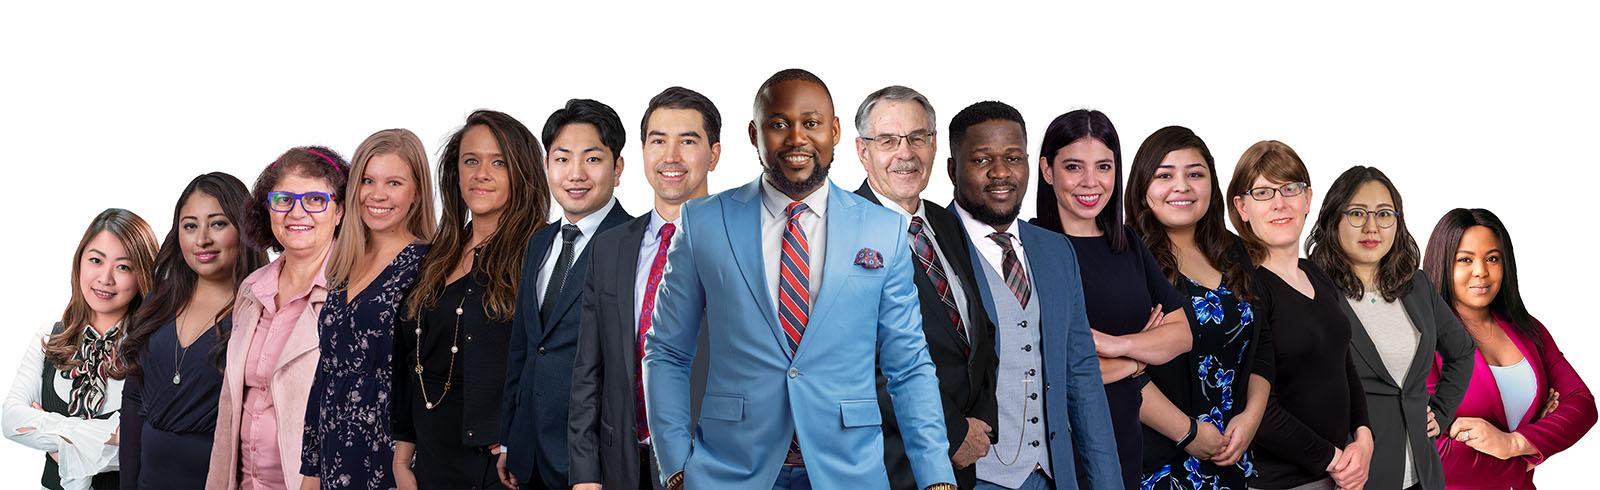 Calgary-Lawyers-Osuji-and-Smith-Award-Winning-Lawyers-Team